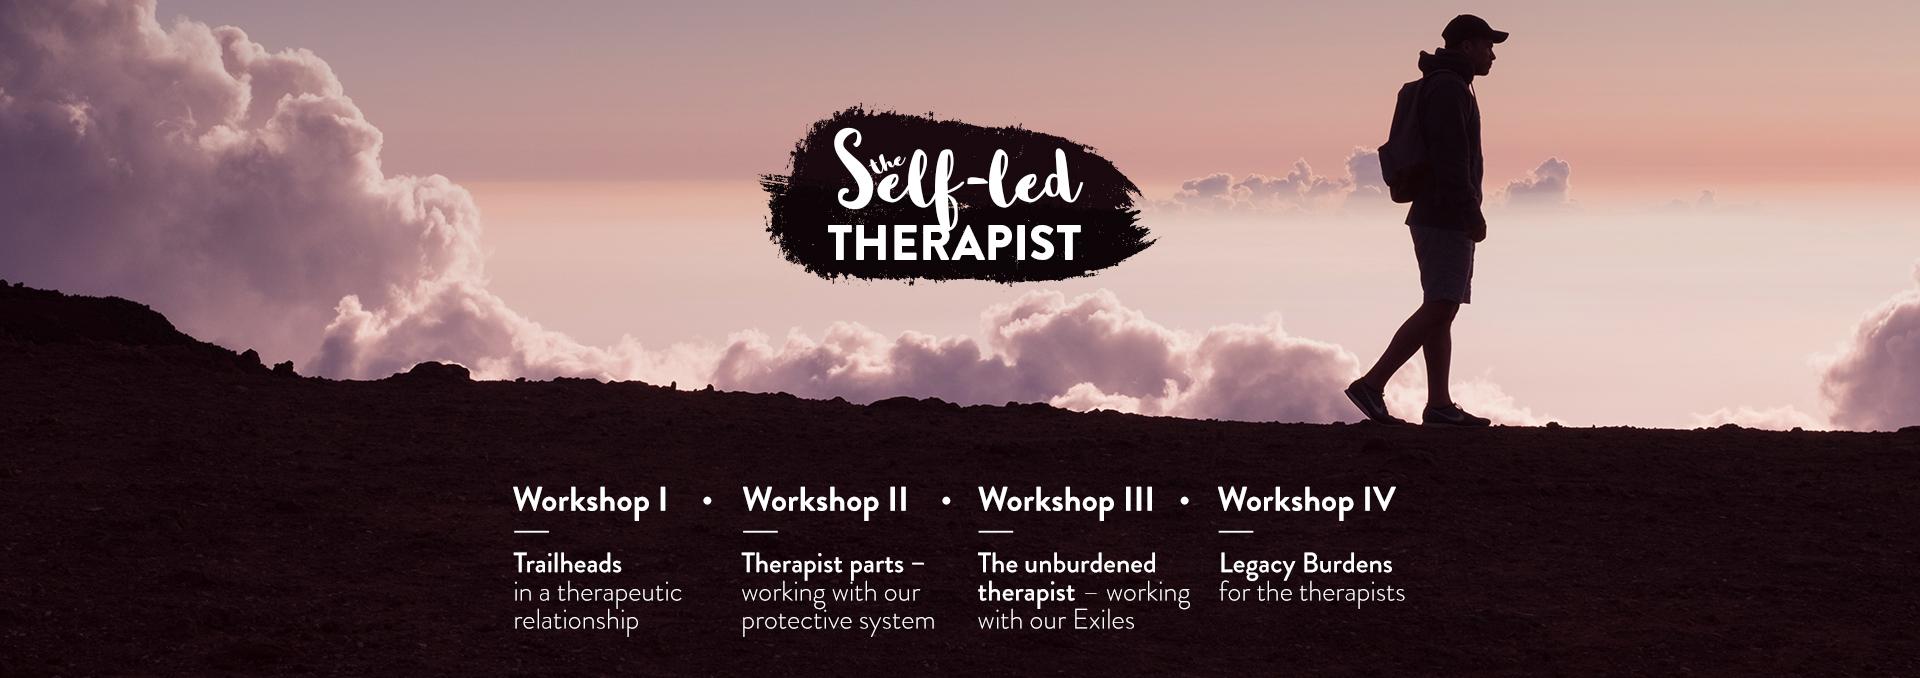 Self-led Therapist 8